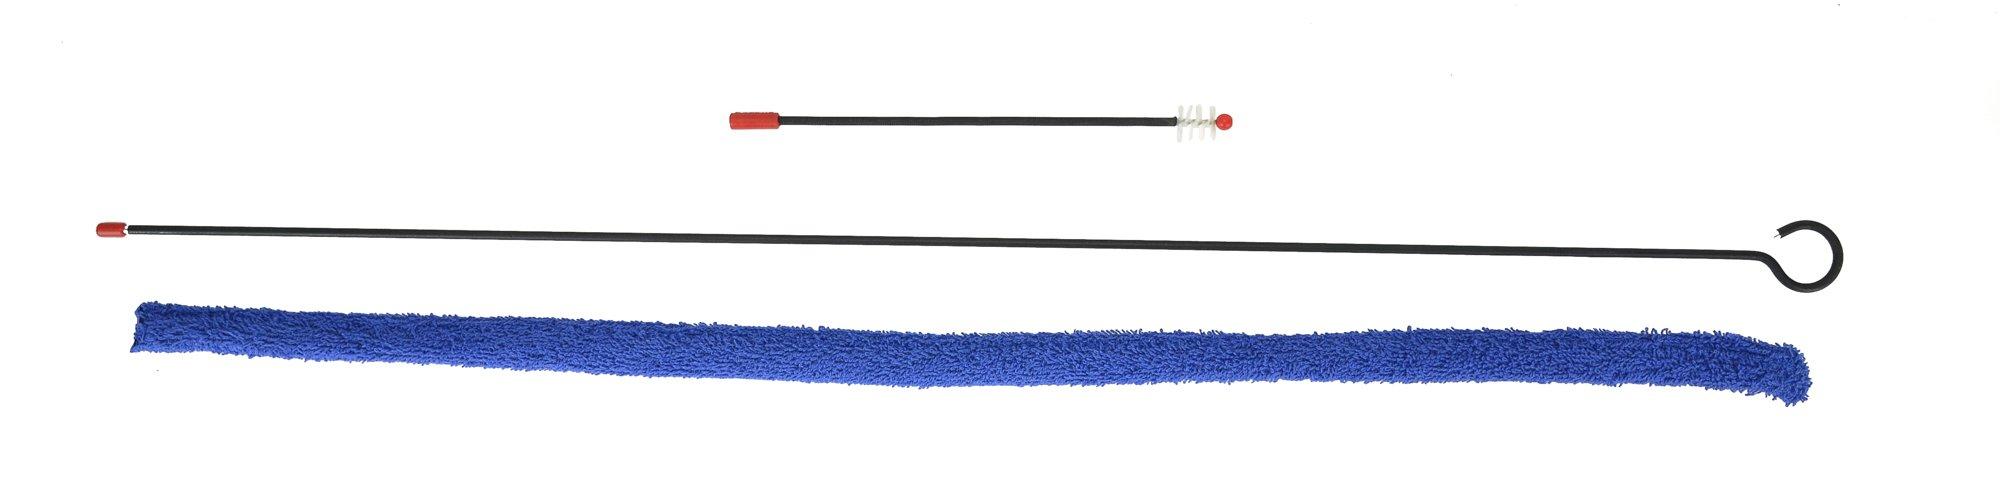 Selmer 337C Trombone Cleaning System Slide-O-Mix